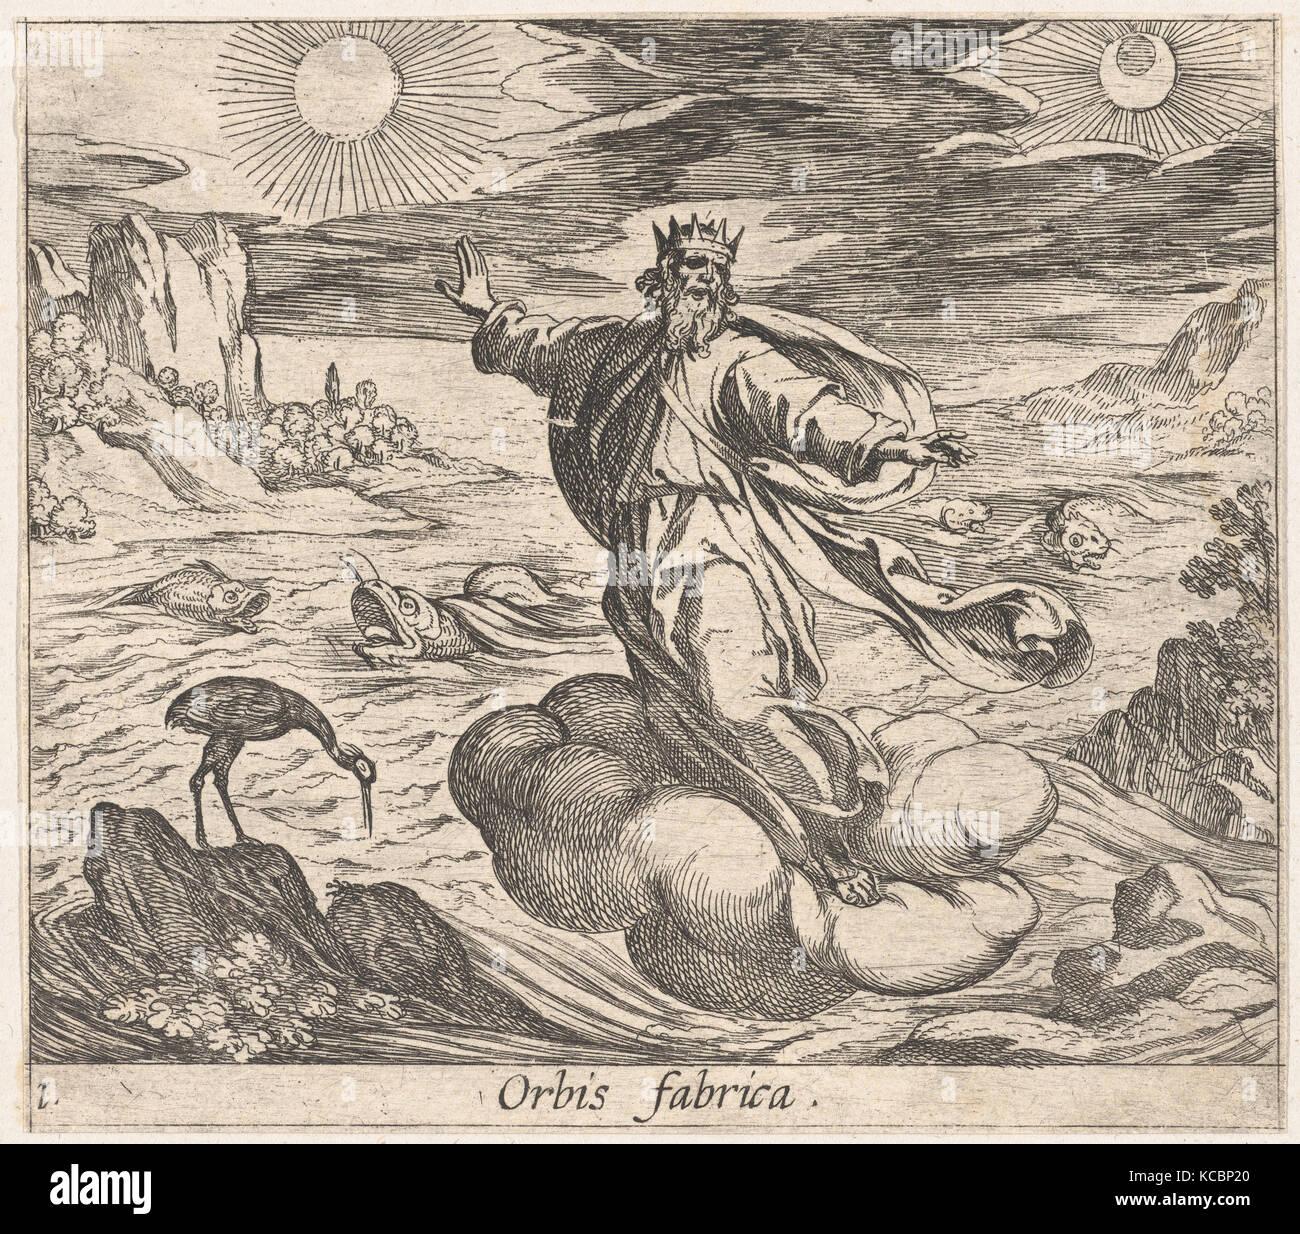 Plate 1: The Creation of the World (Orbis fabrica), from Ovid's 'Metamorphoses', Antonio Tempesta, 1606 - Stock Image